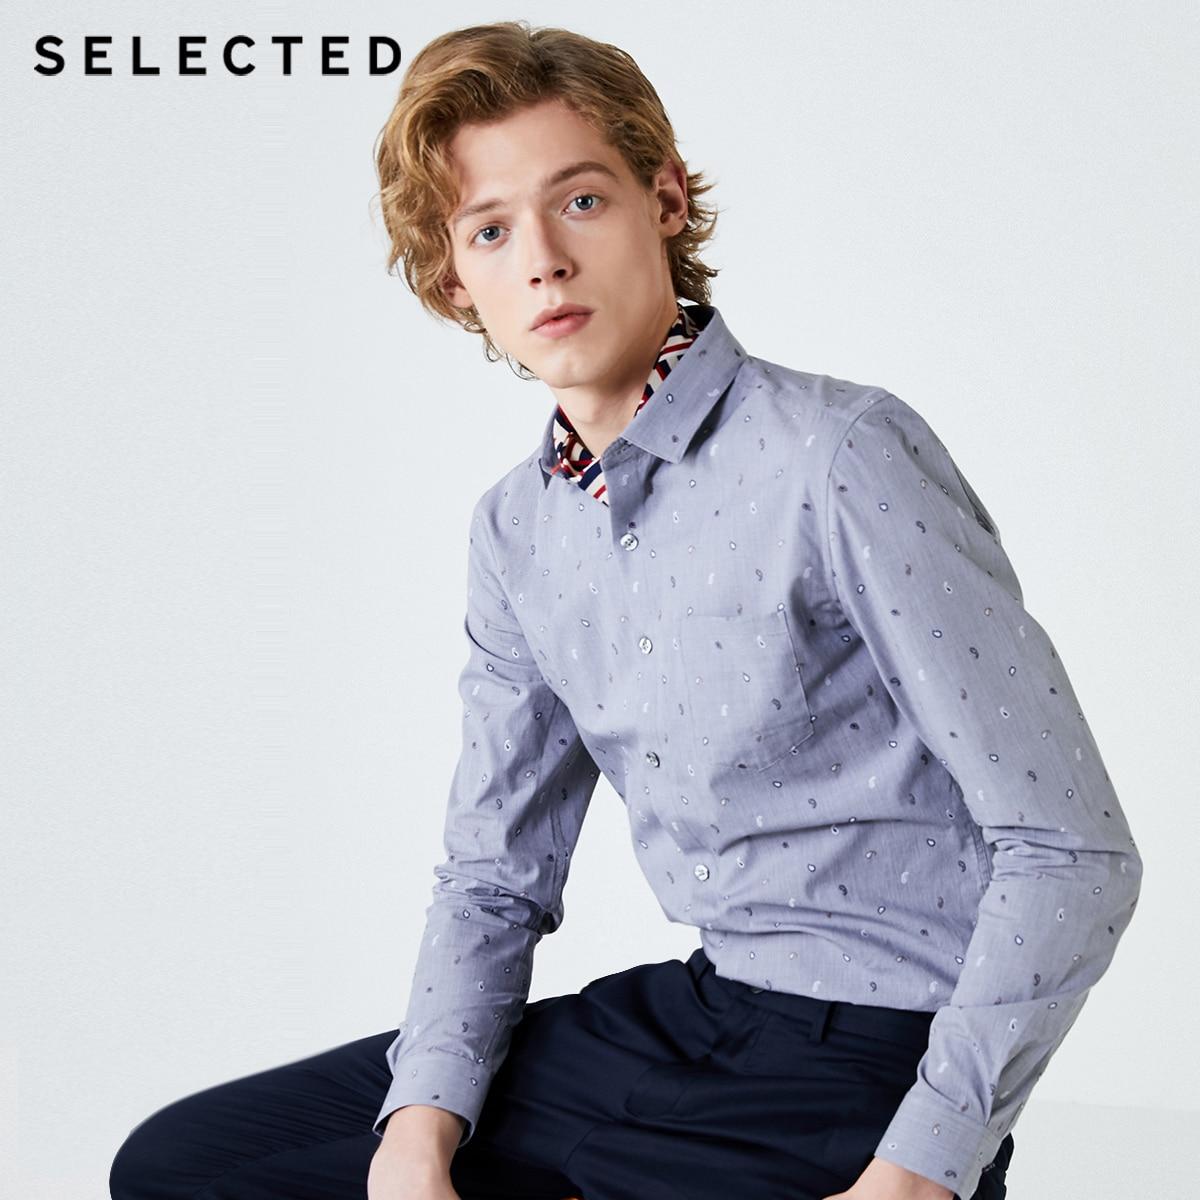 Camisa de manga larga bordada ajustada de algodón 100% para hombres seleccionados S   419305525